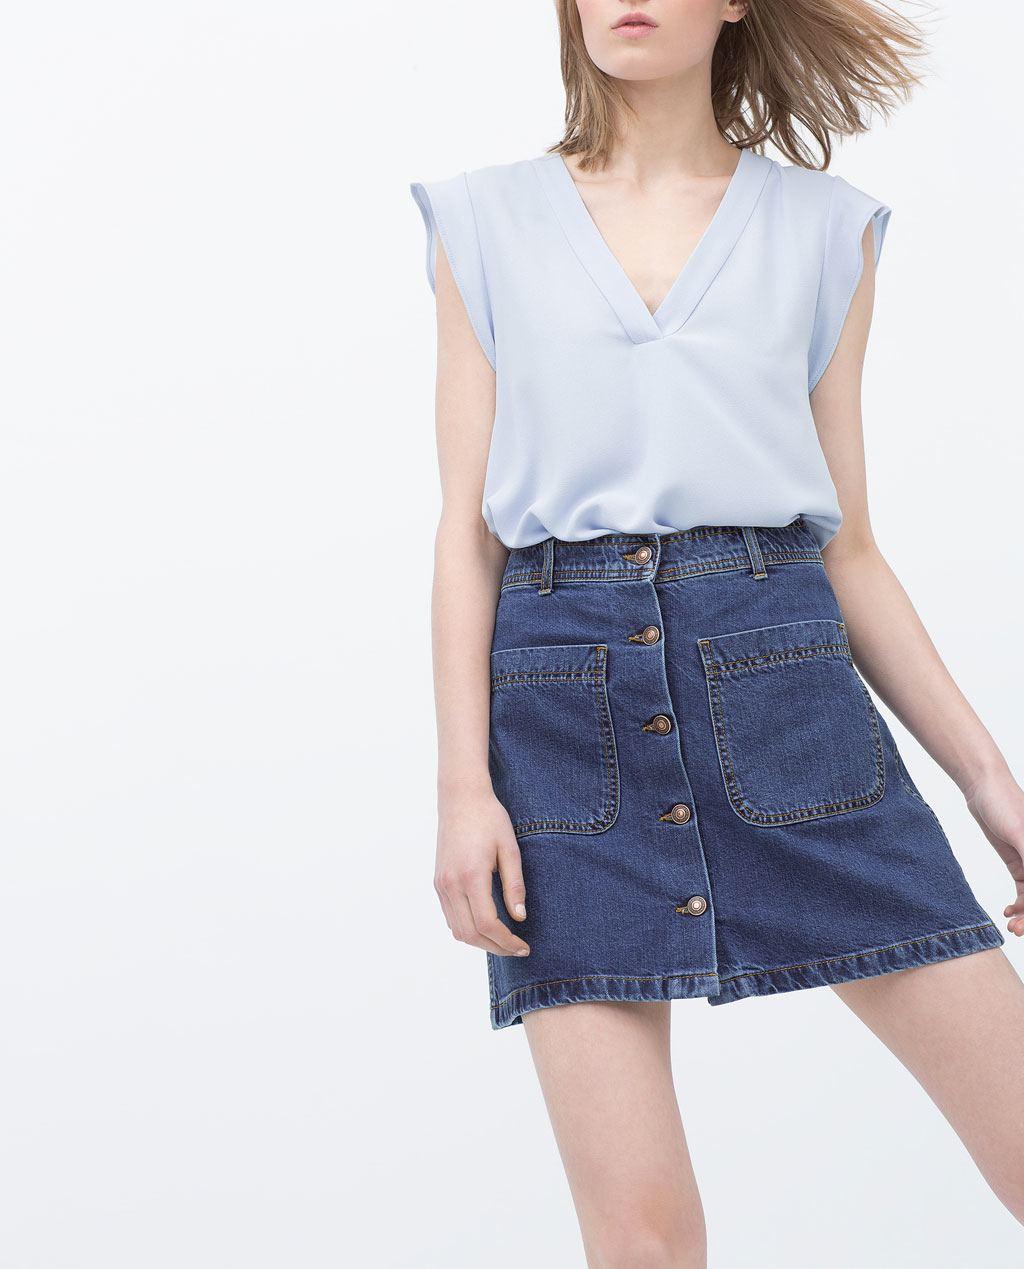 Zara - jupe ( 40€ )